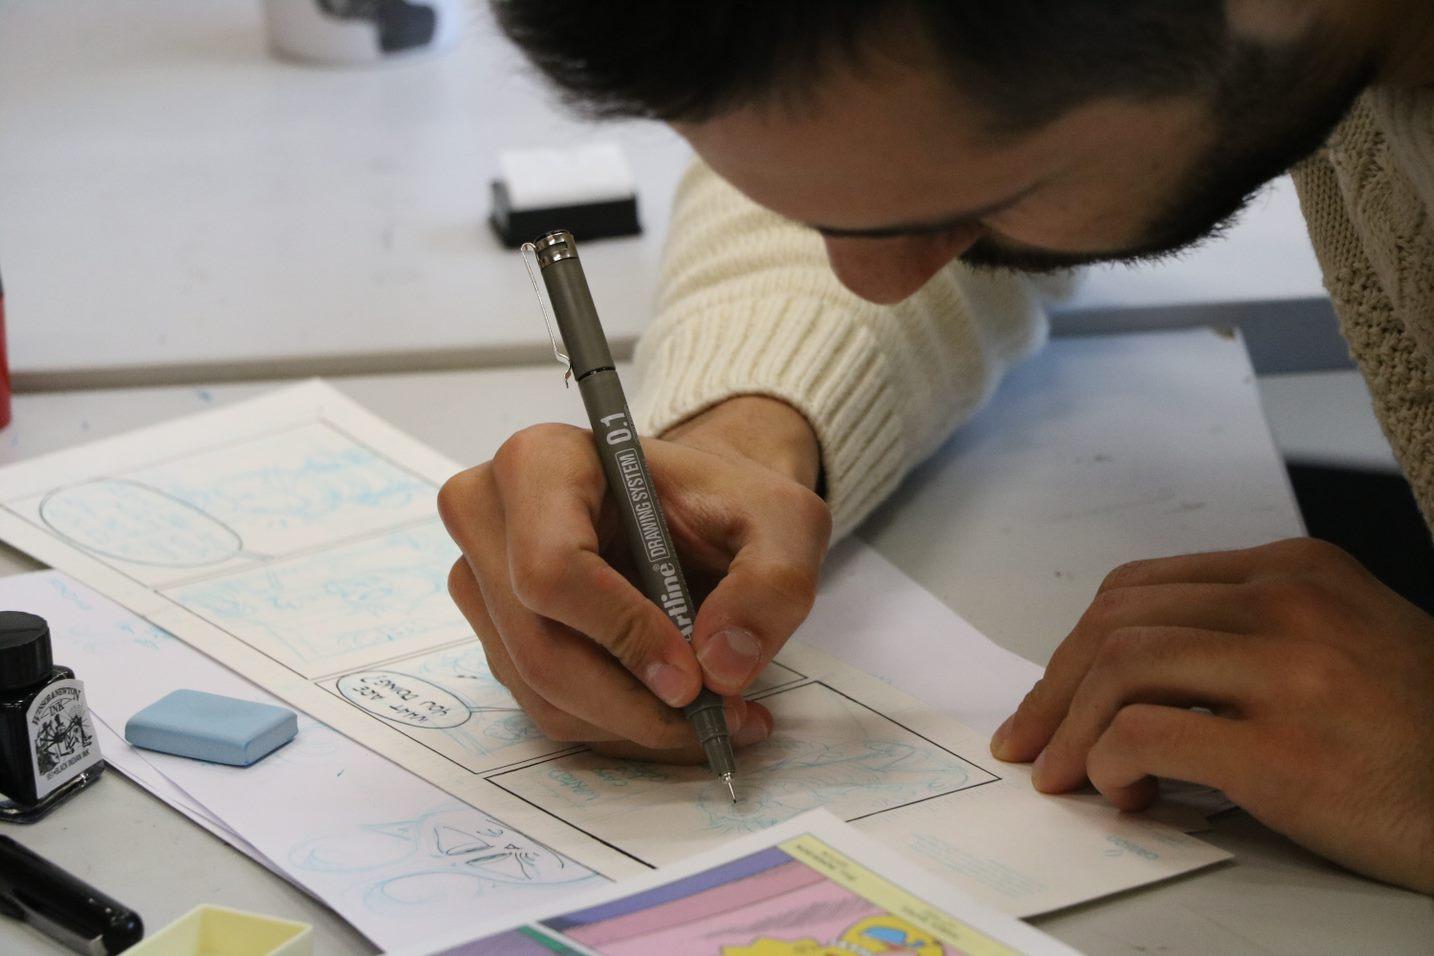 Illustrating Comics